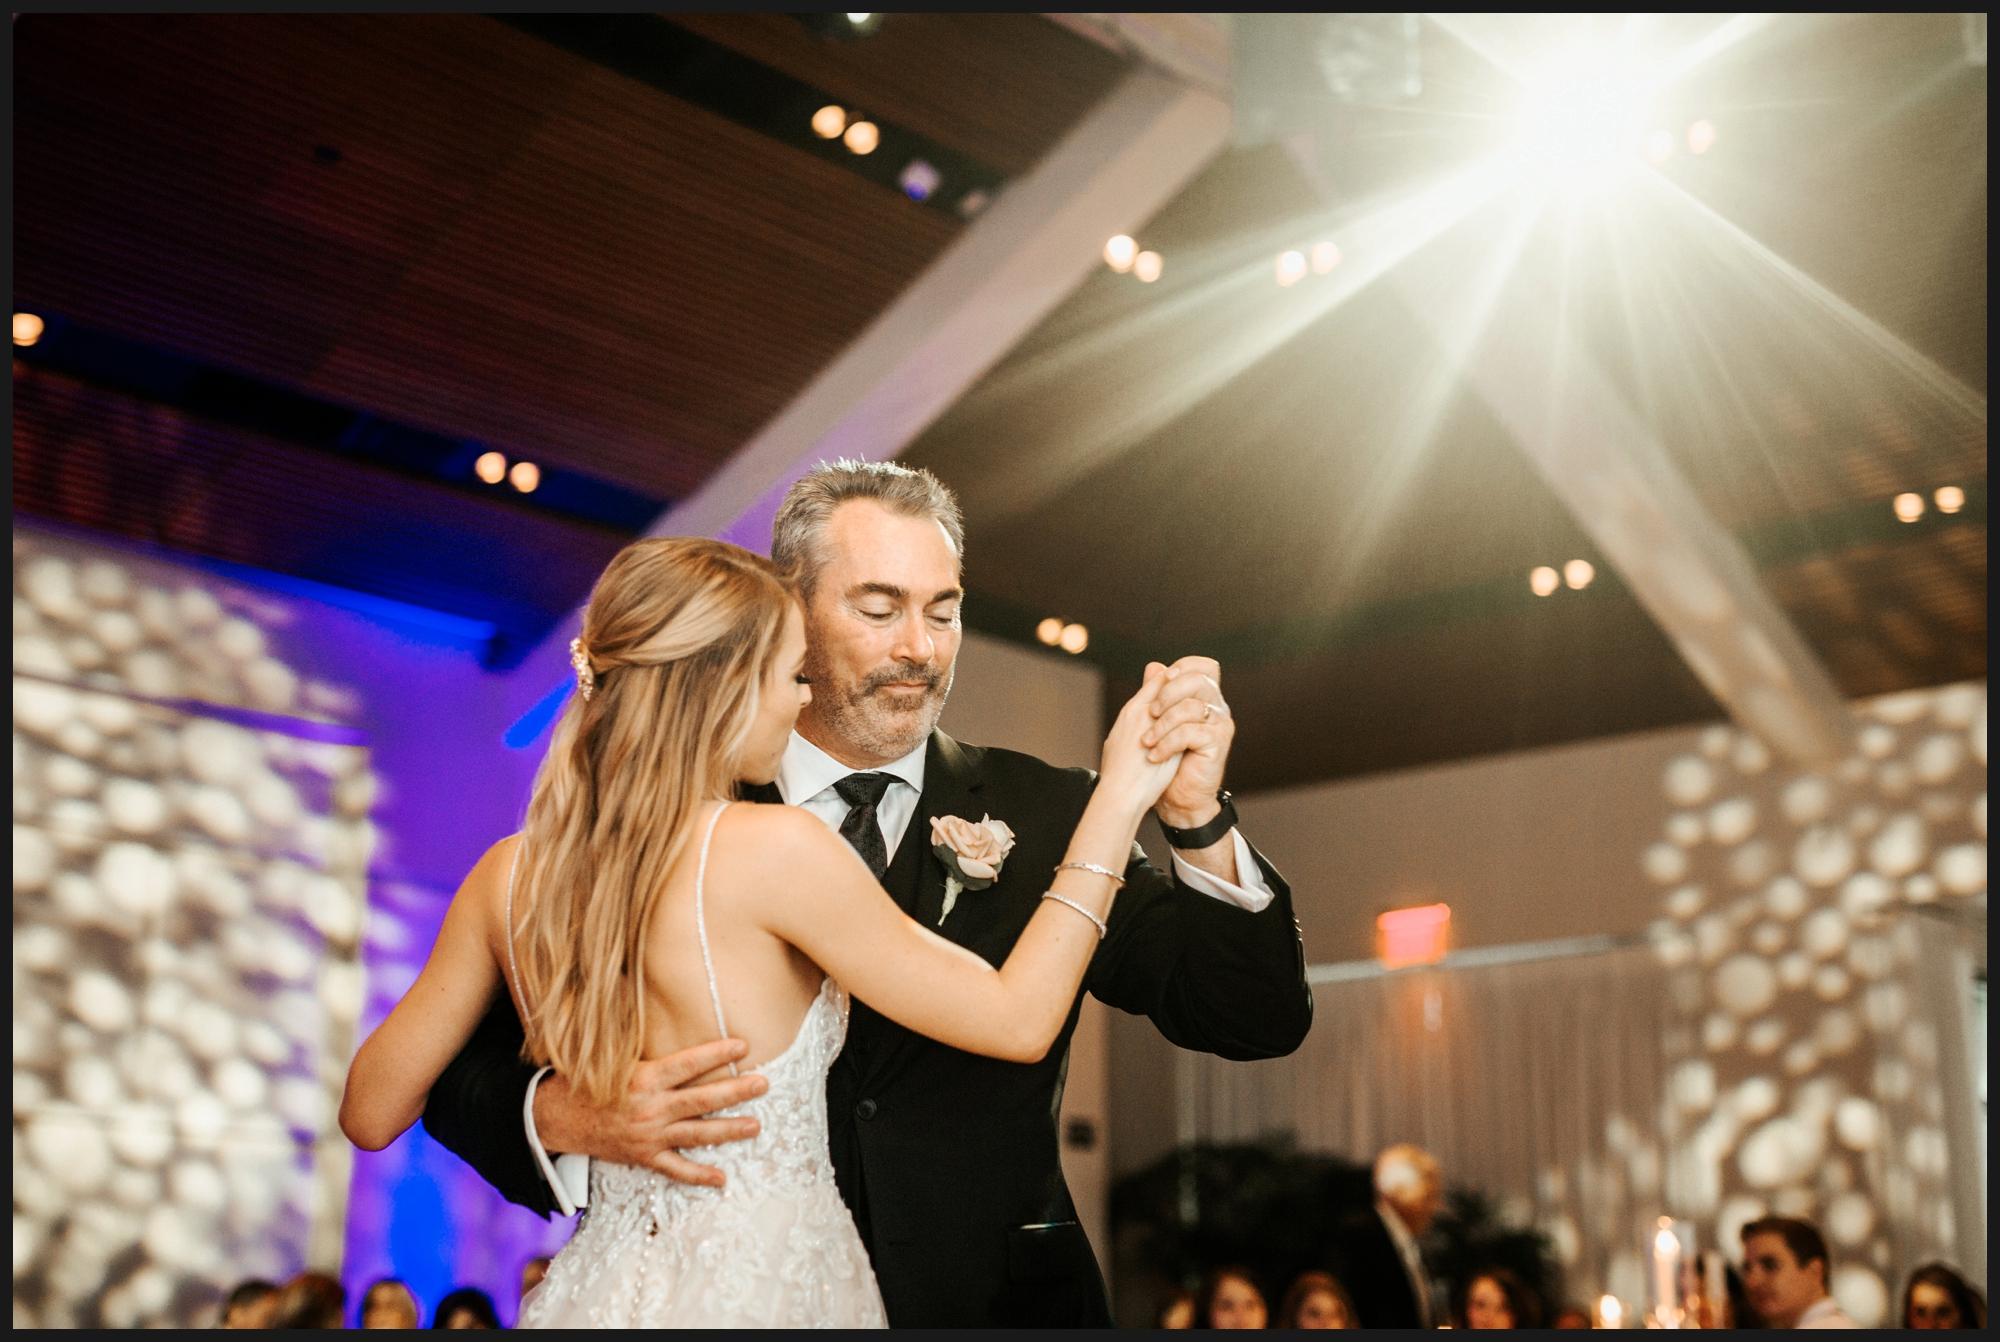 Orlando-Wedding-Photographer-destination-wedding-photographer-florida-wedding-photographer-bohemian-wedding-photographer_0114.jpg